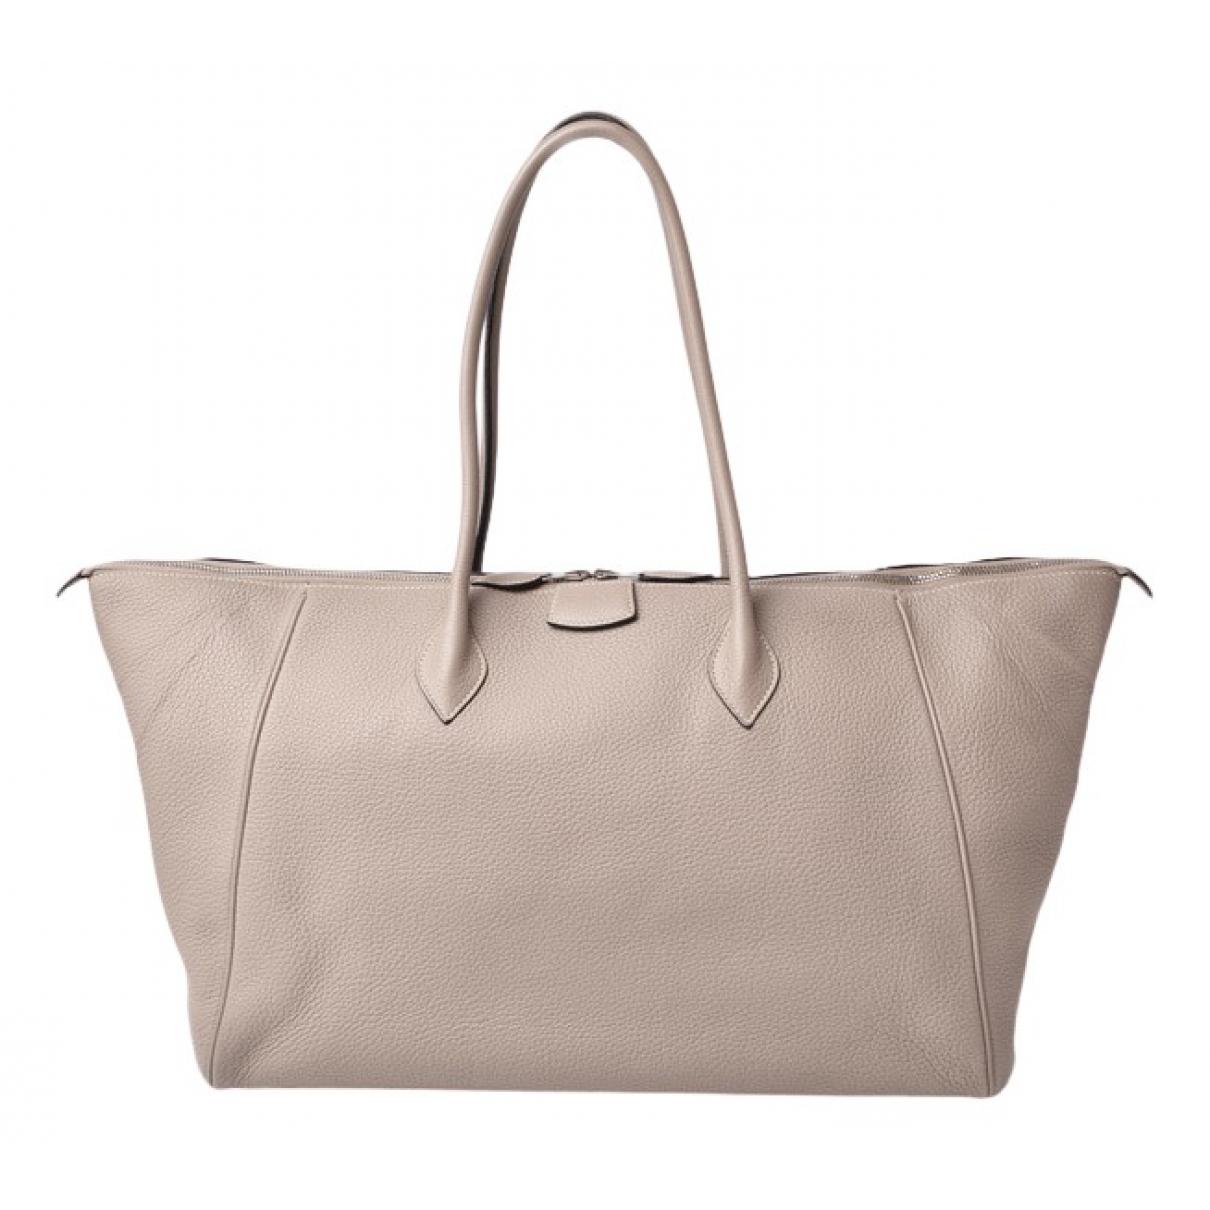 Hermès N Grey Leather handbag for Women N